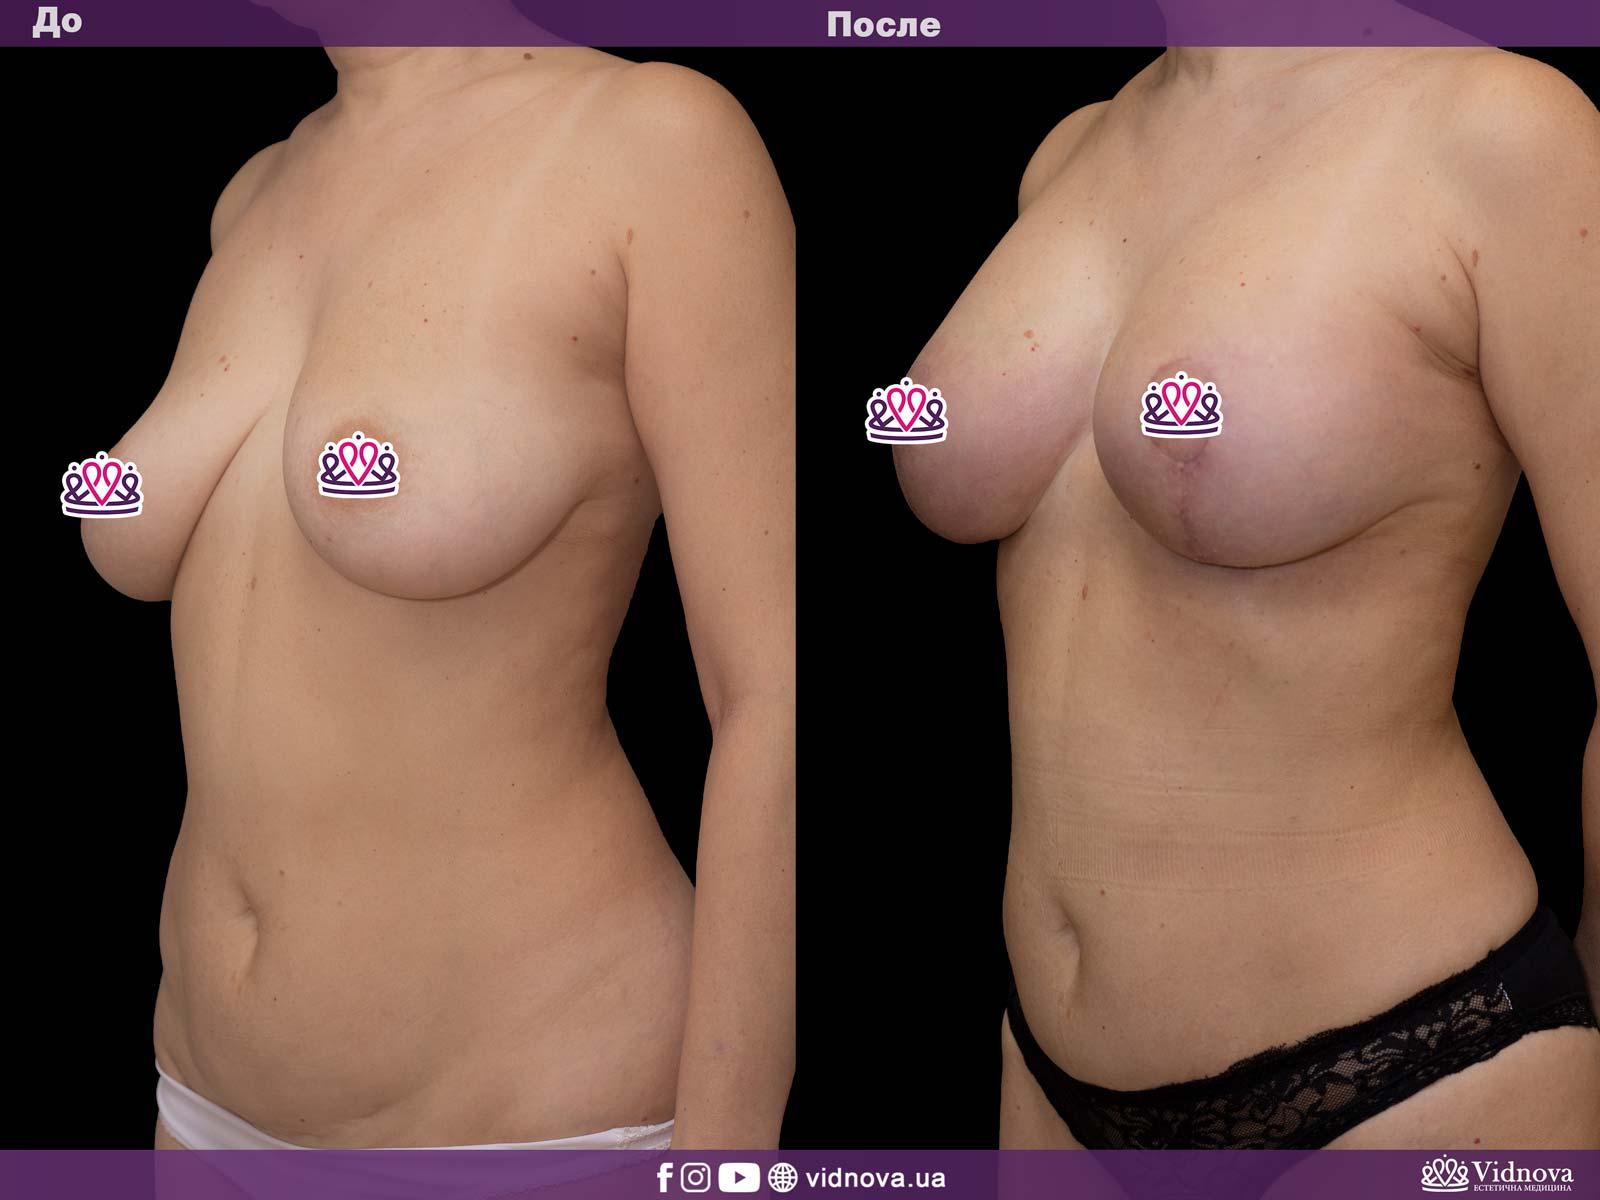 Подтяжка груди: Фото ДО и ПОСЛЕ - Пример №15-2 - Клиника Vidnova